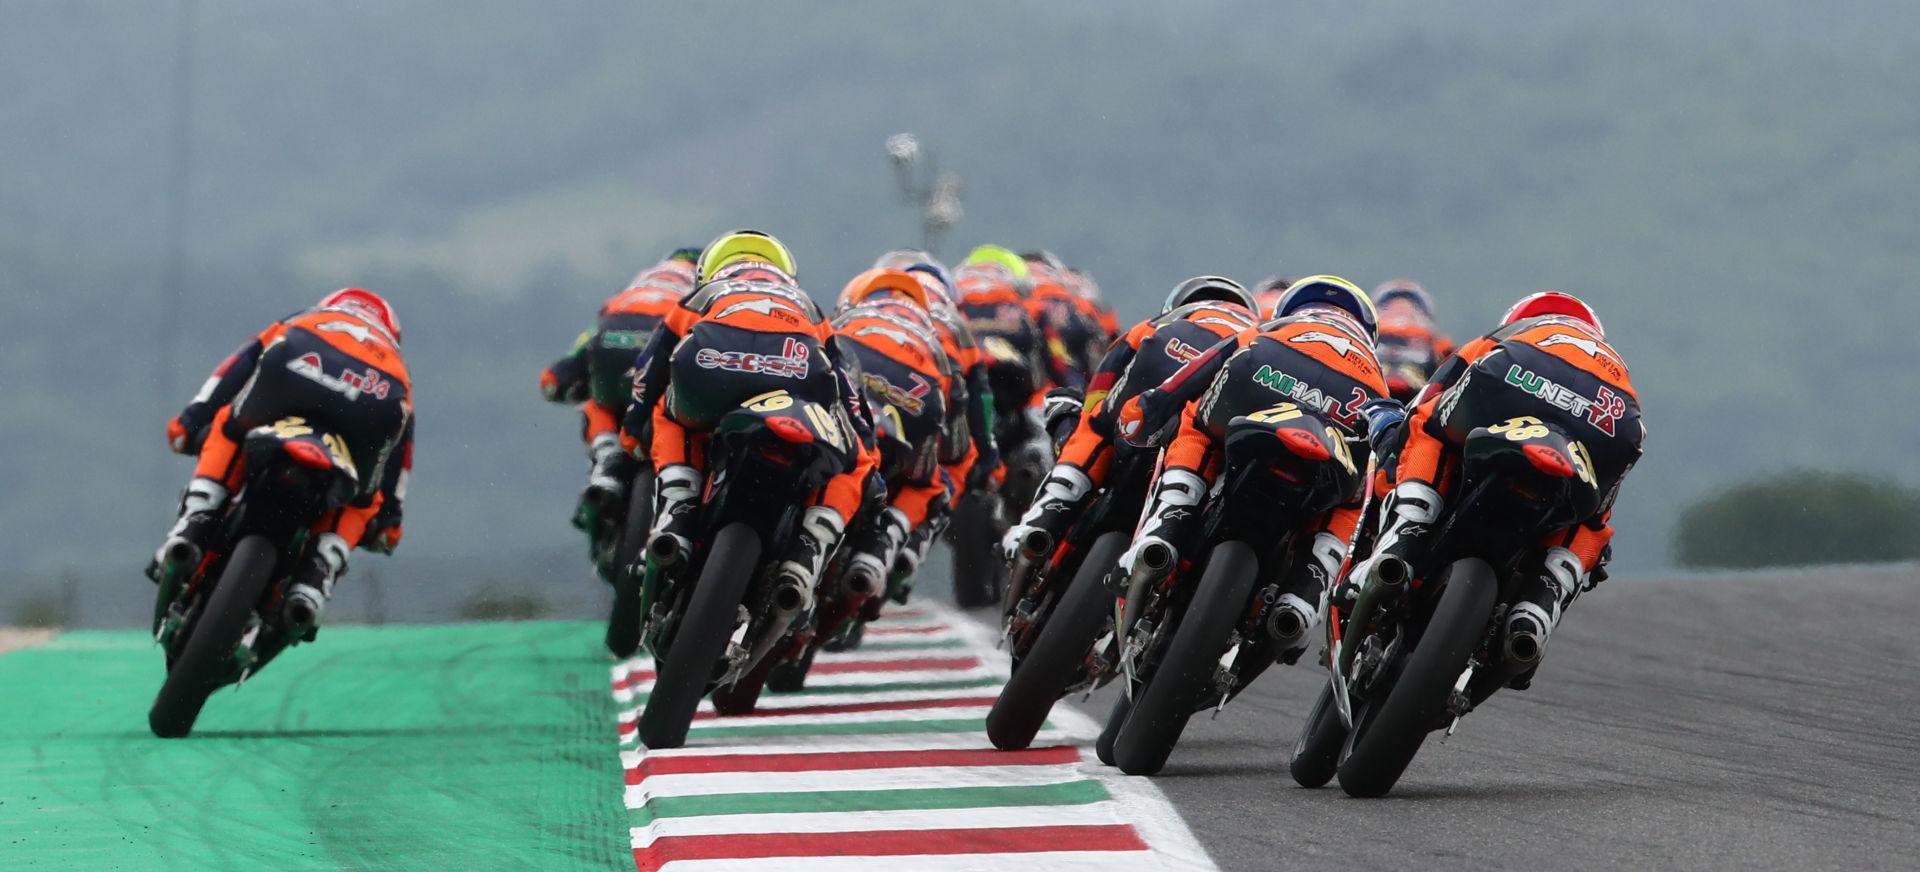 Red Bull MotoGP Rookies Cup Will Be Decided At MotorLand Aragon - RoadracingWorld.com